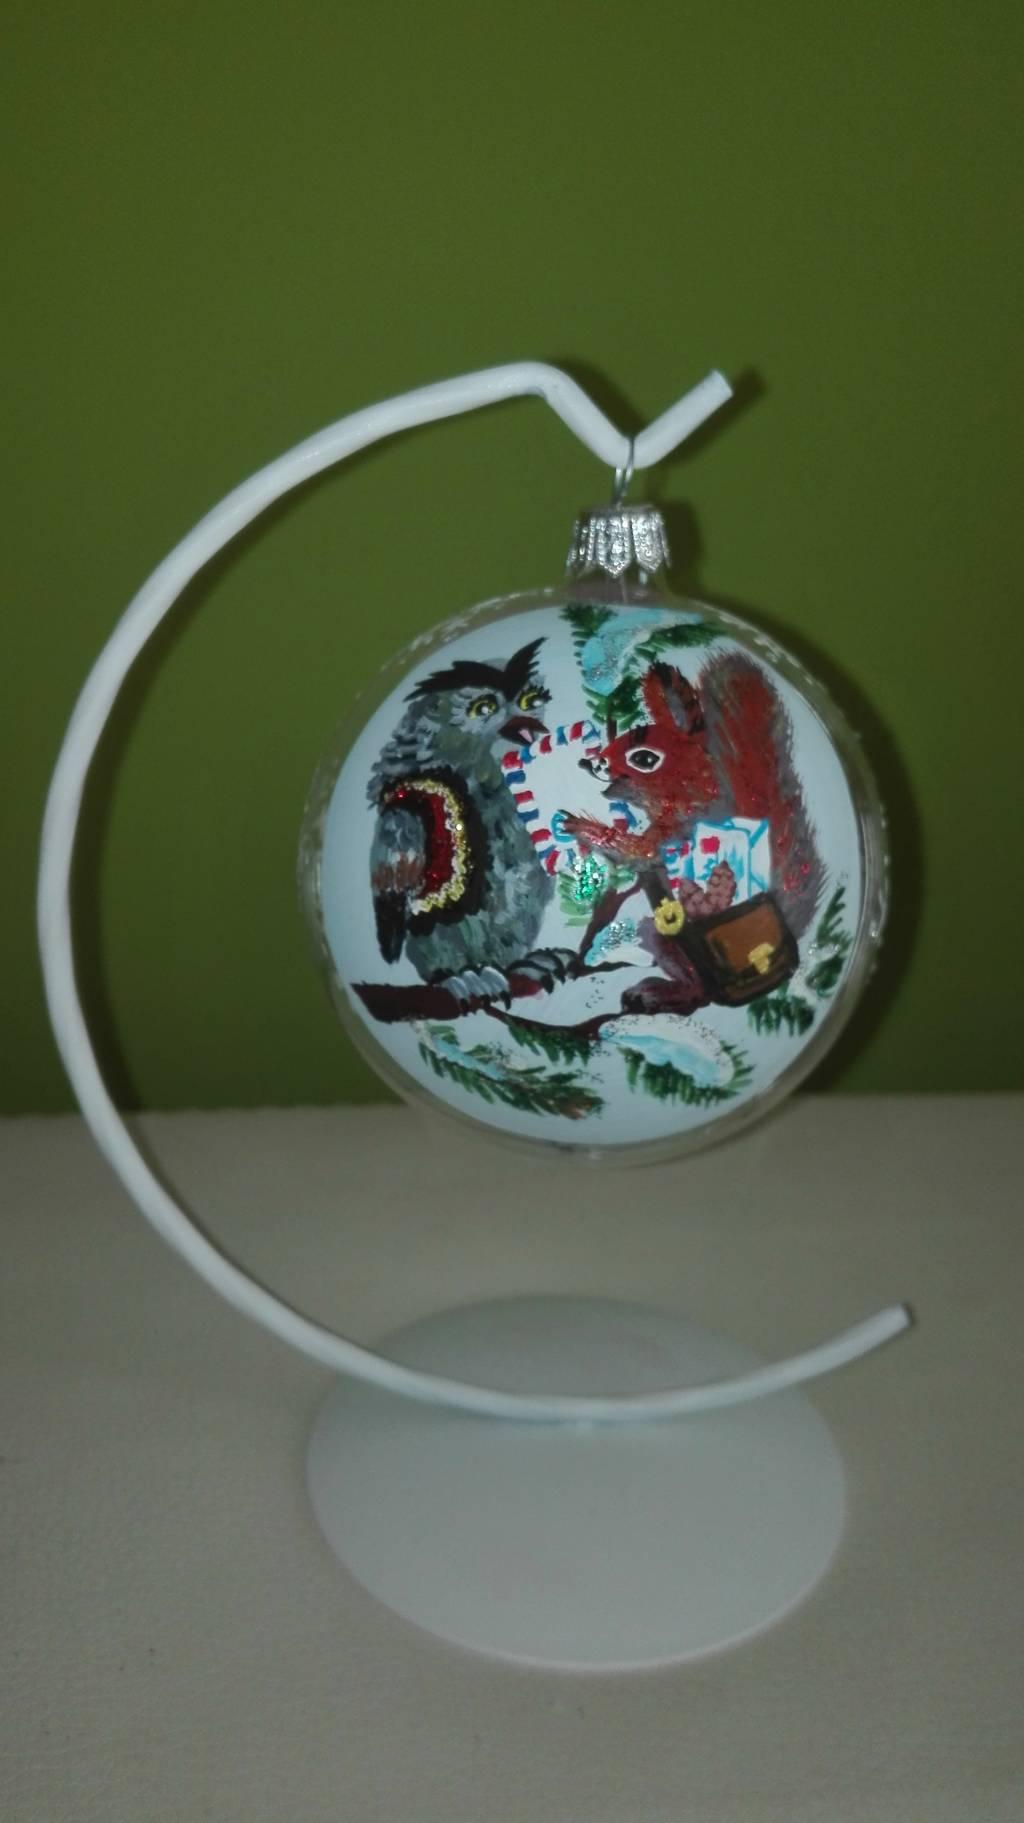 Glob de sticla, pictat manual cu culori